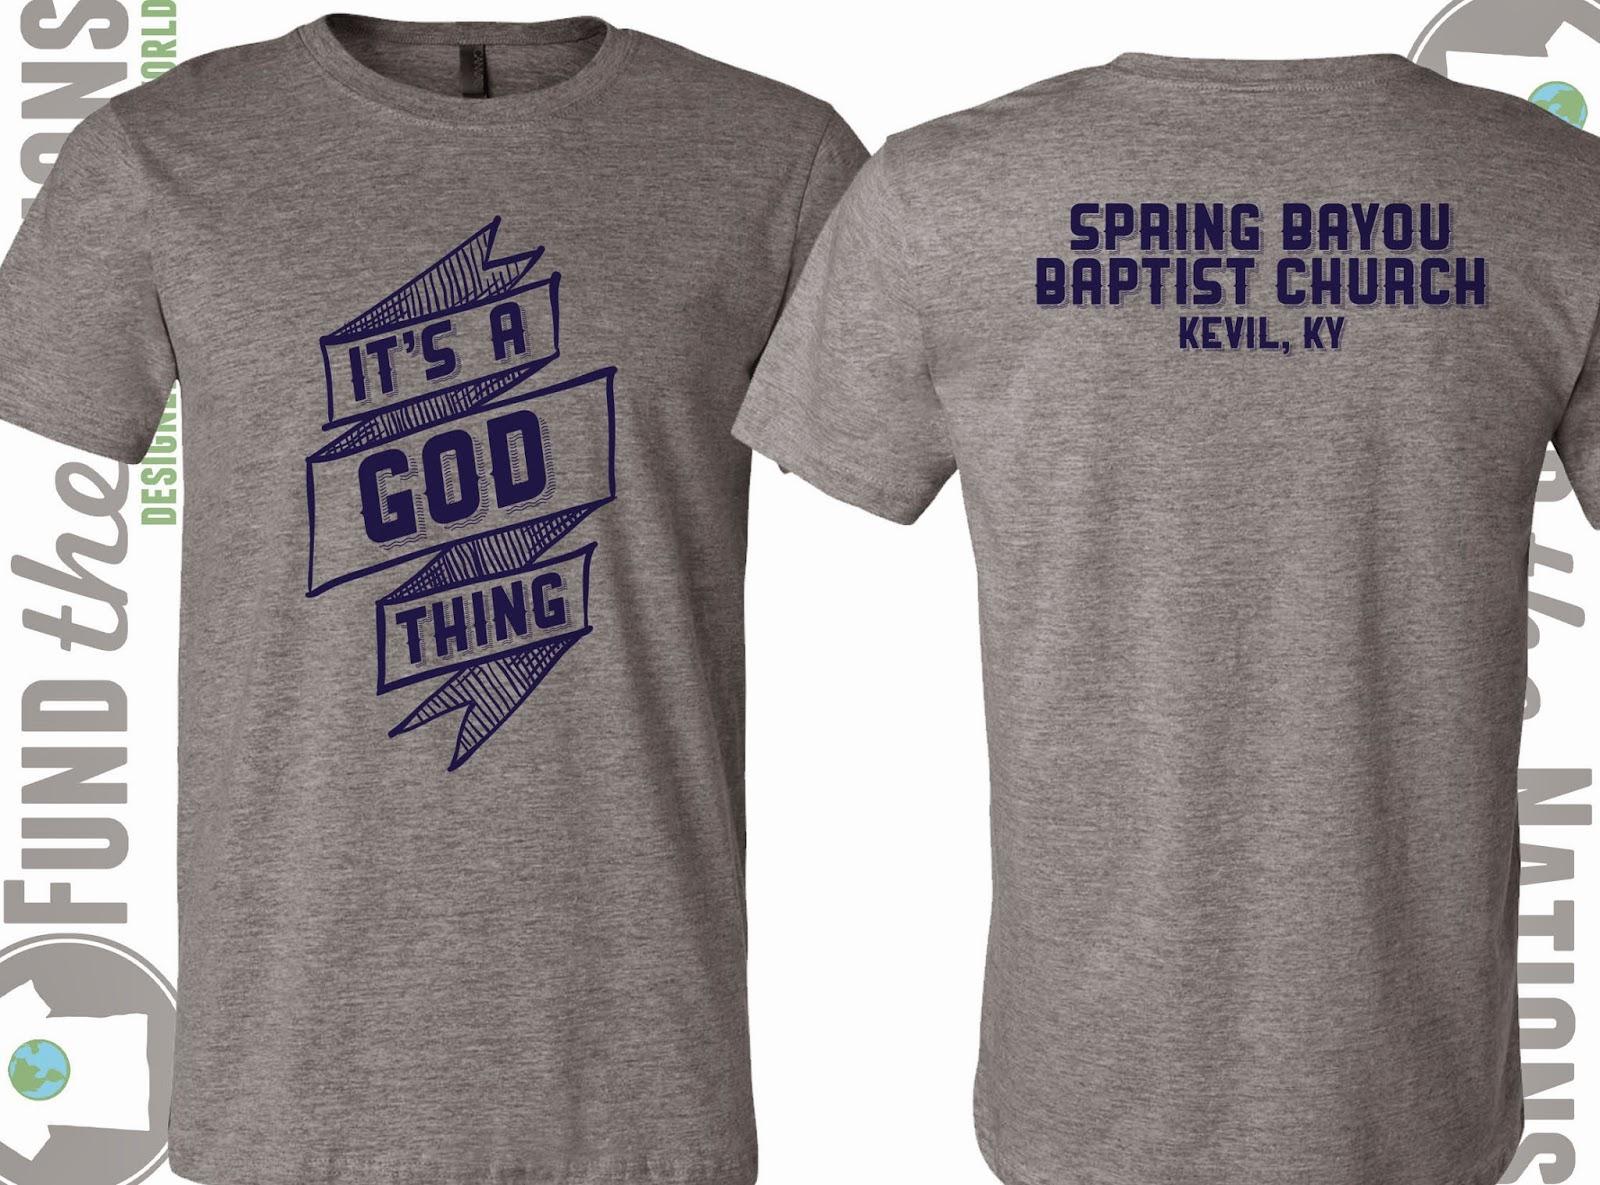 5272de66 Youth T Shirt Designs For Church